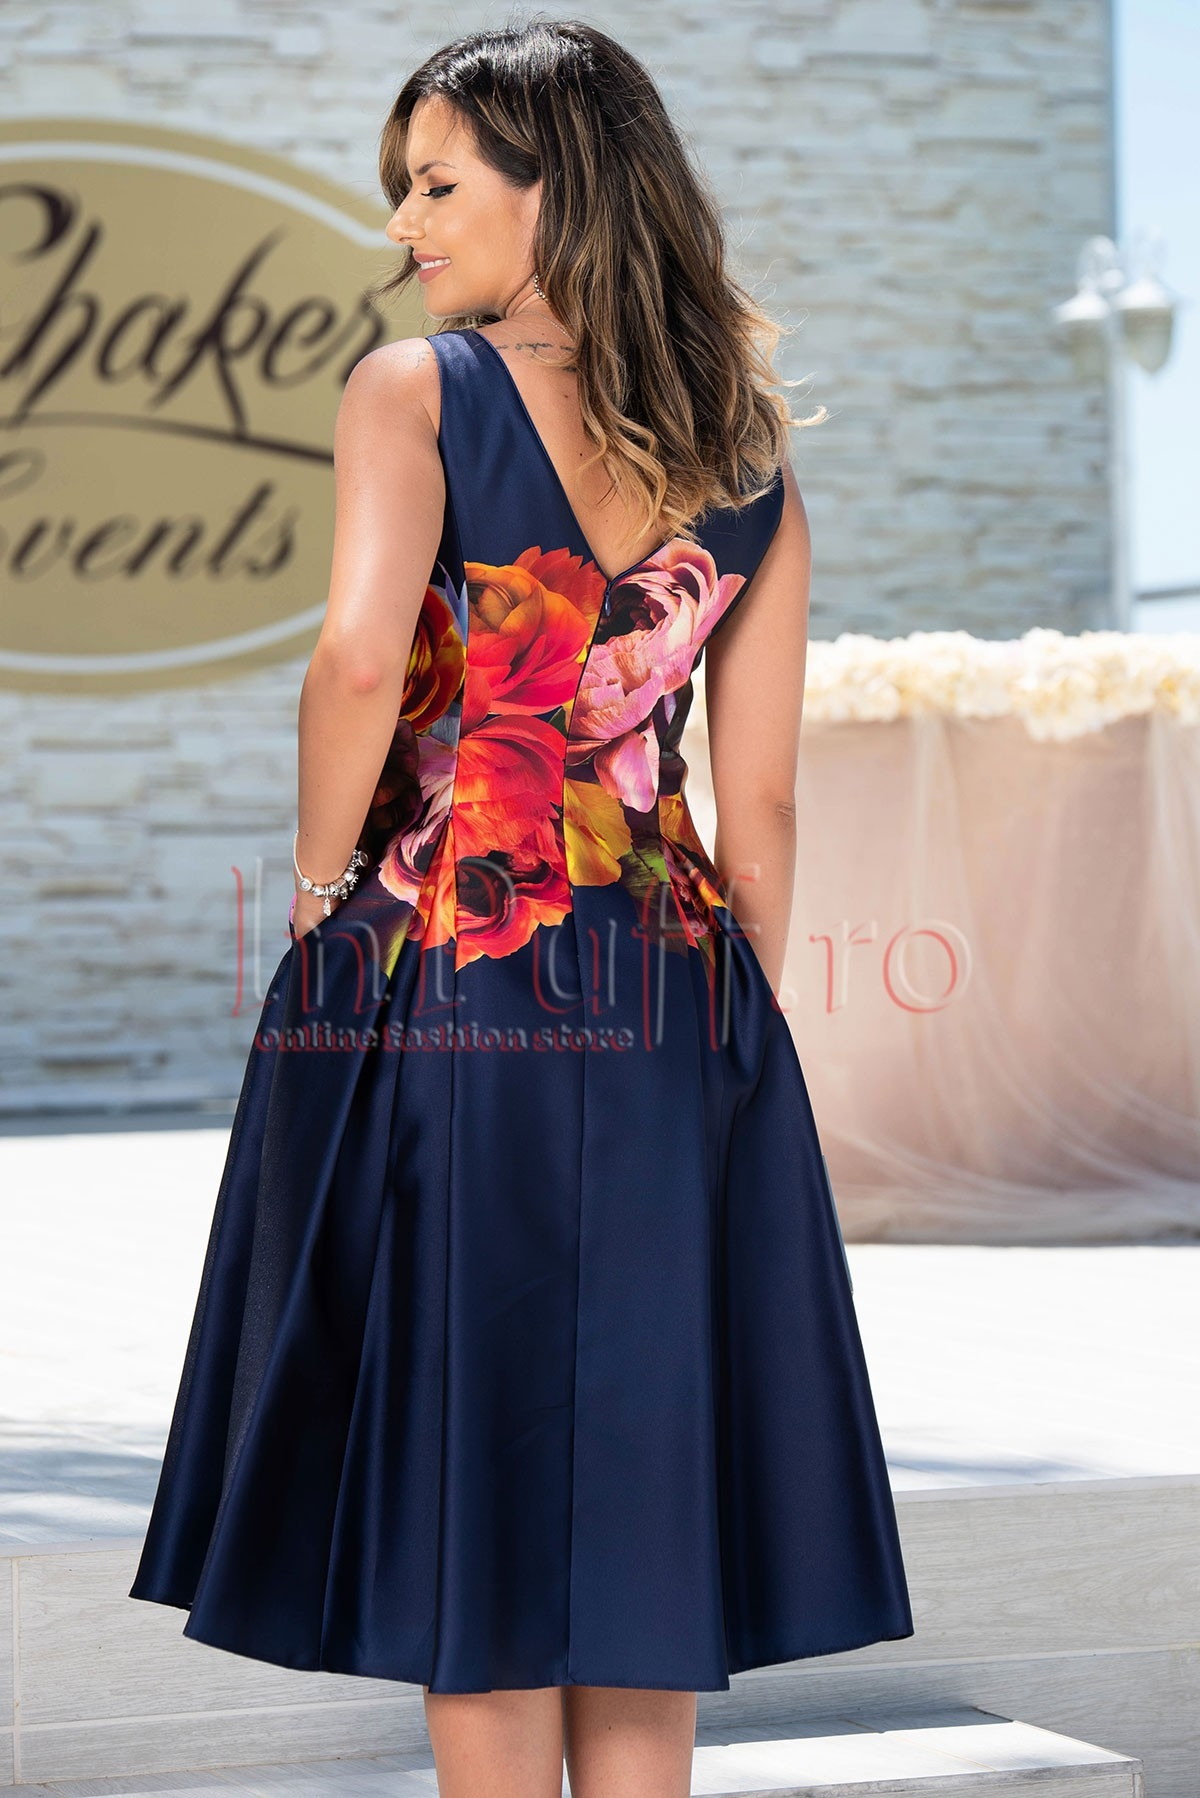 Rochie de seara din tafta bleumarin cu imprimeu floral trandafiri